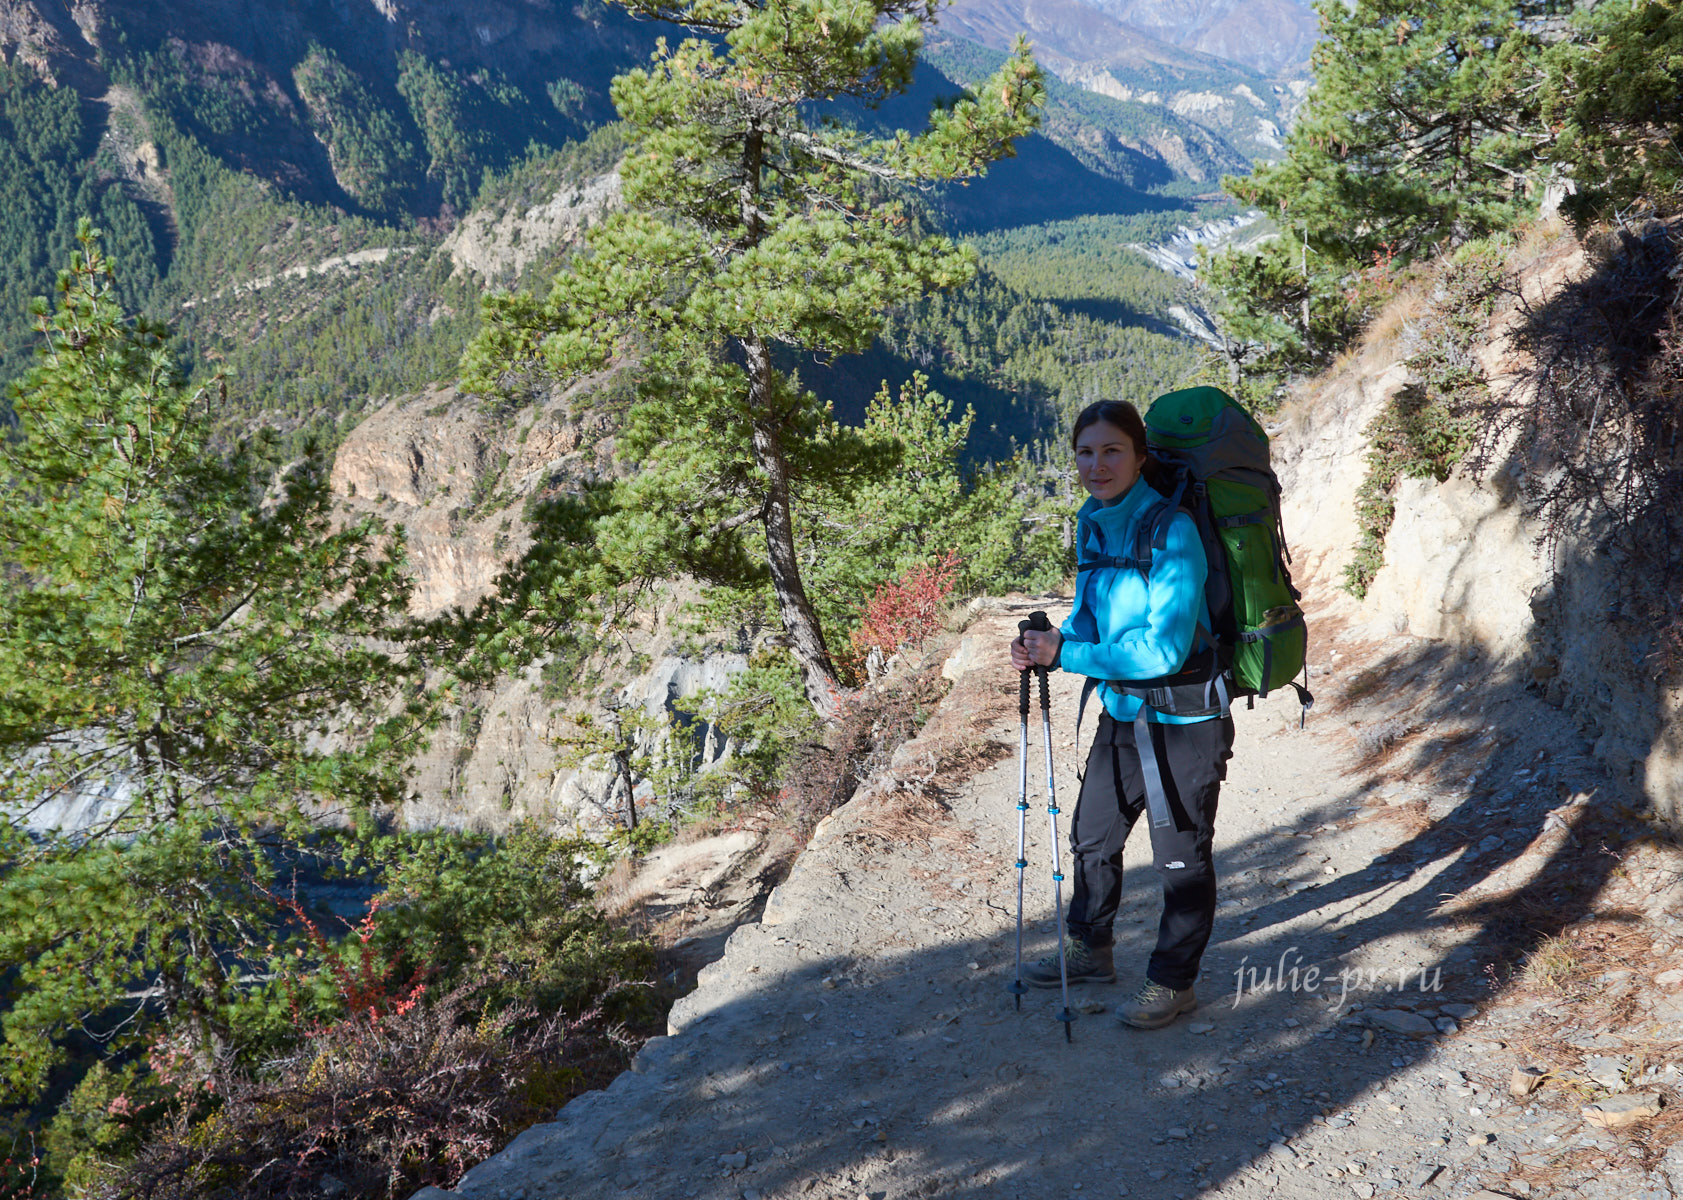 Непал, Трек вокруг Аннапурны, Туристы